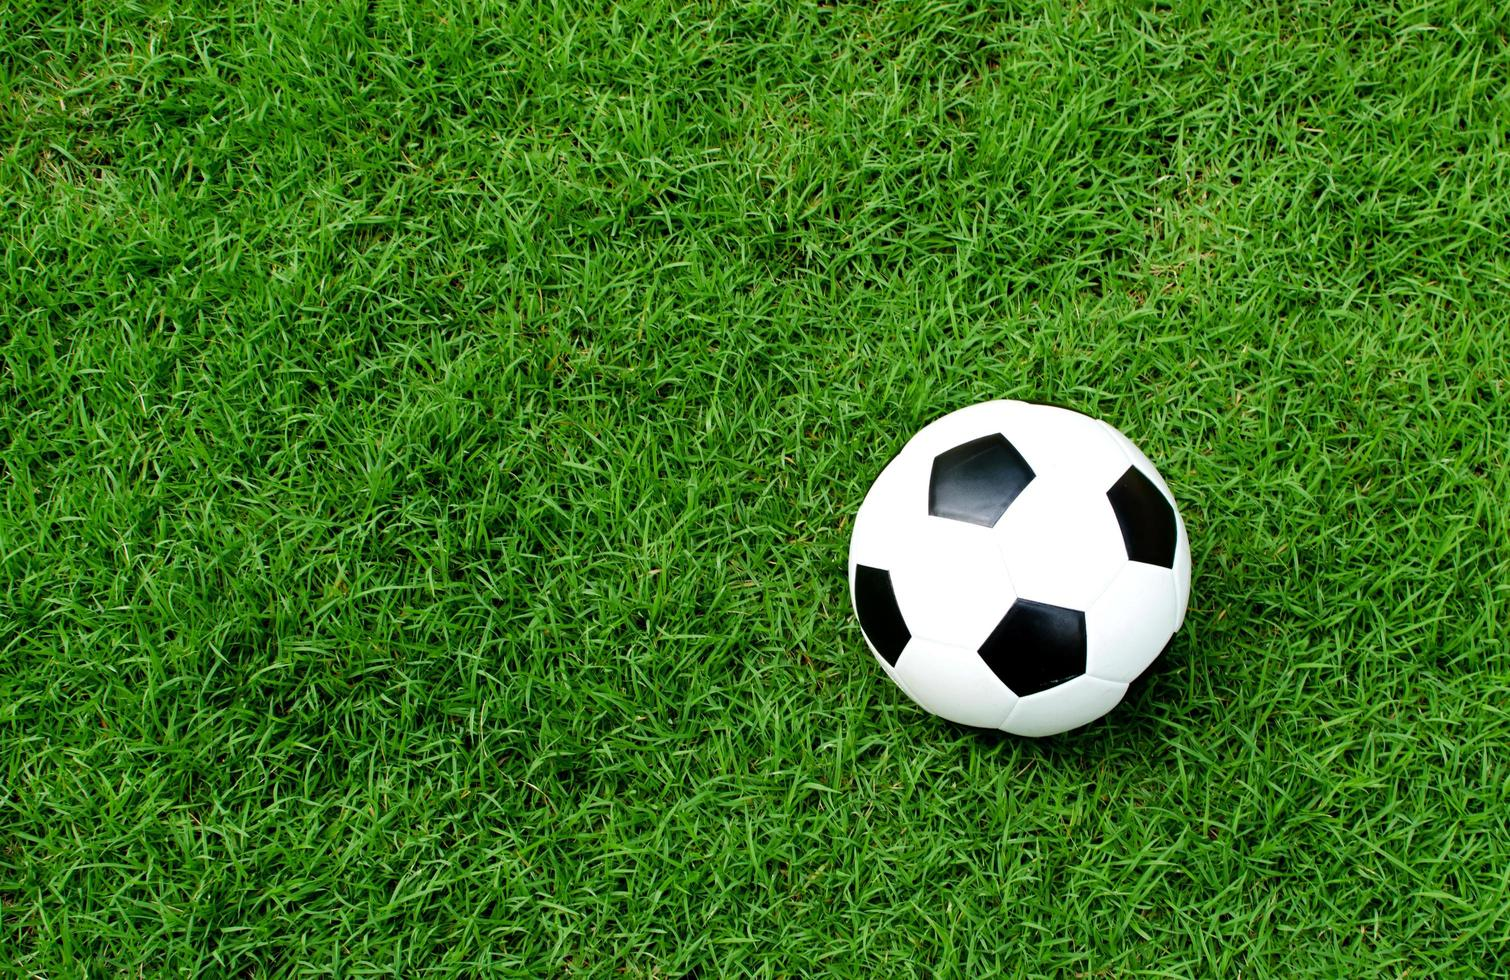 bola de futebol no gramado 1946627 Foto de stock no Vecteezy